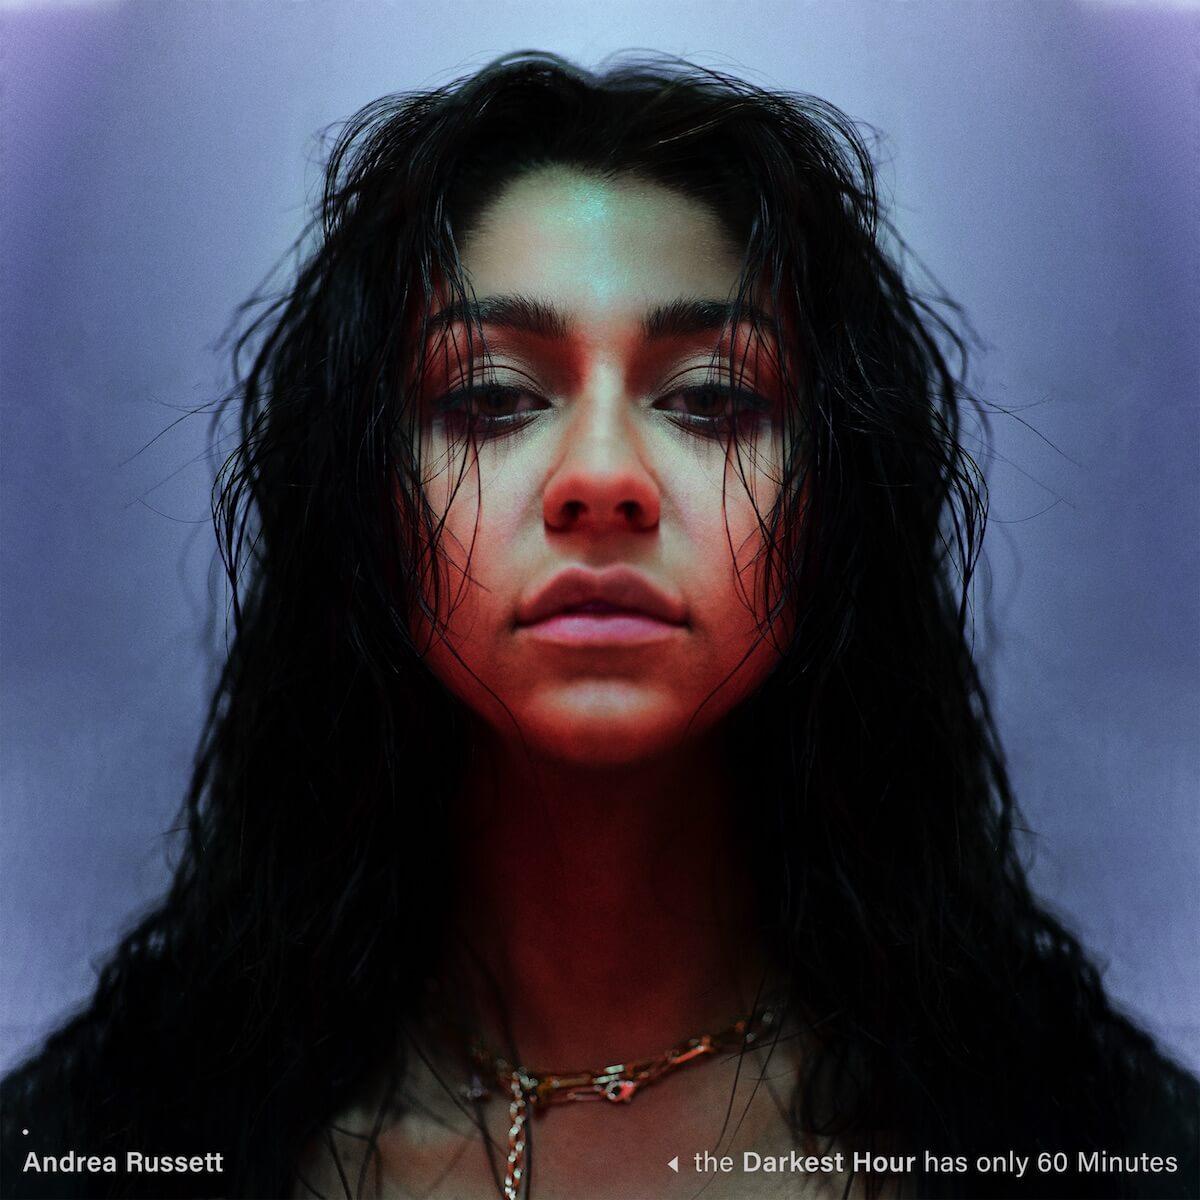 Andrea Russett Discusses Her Debut Single Darkest Hour